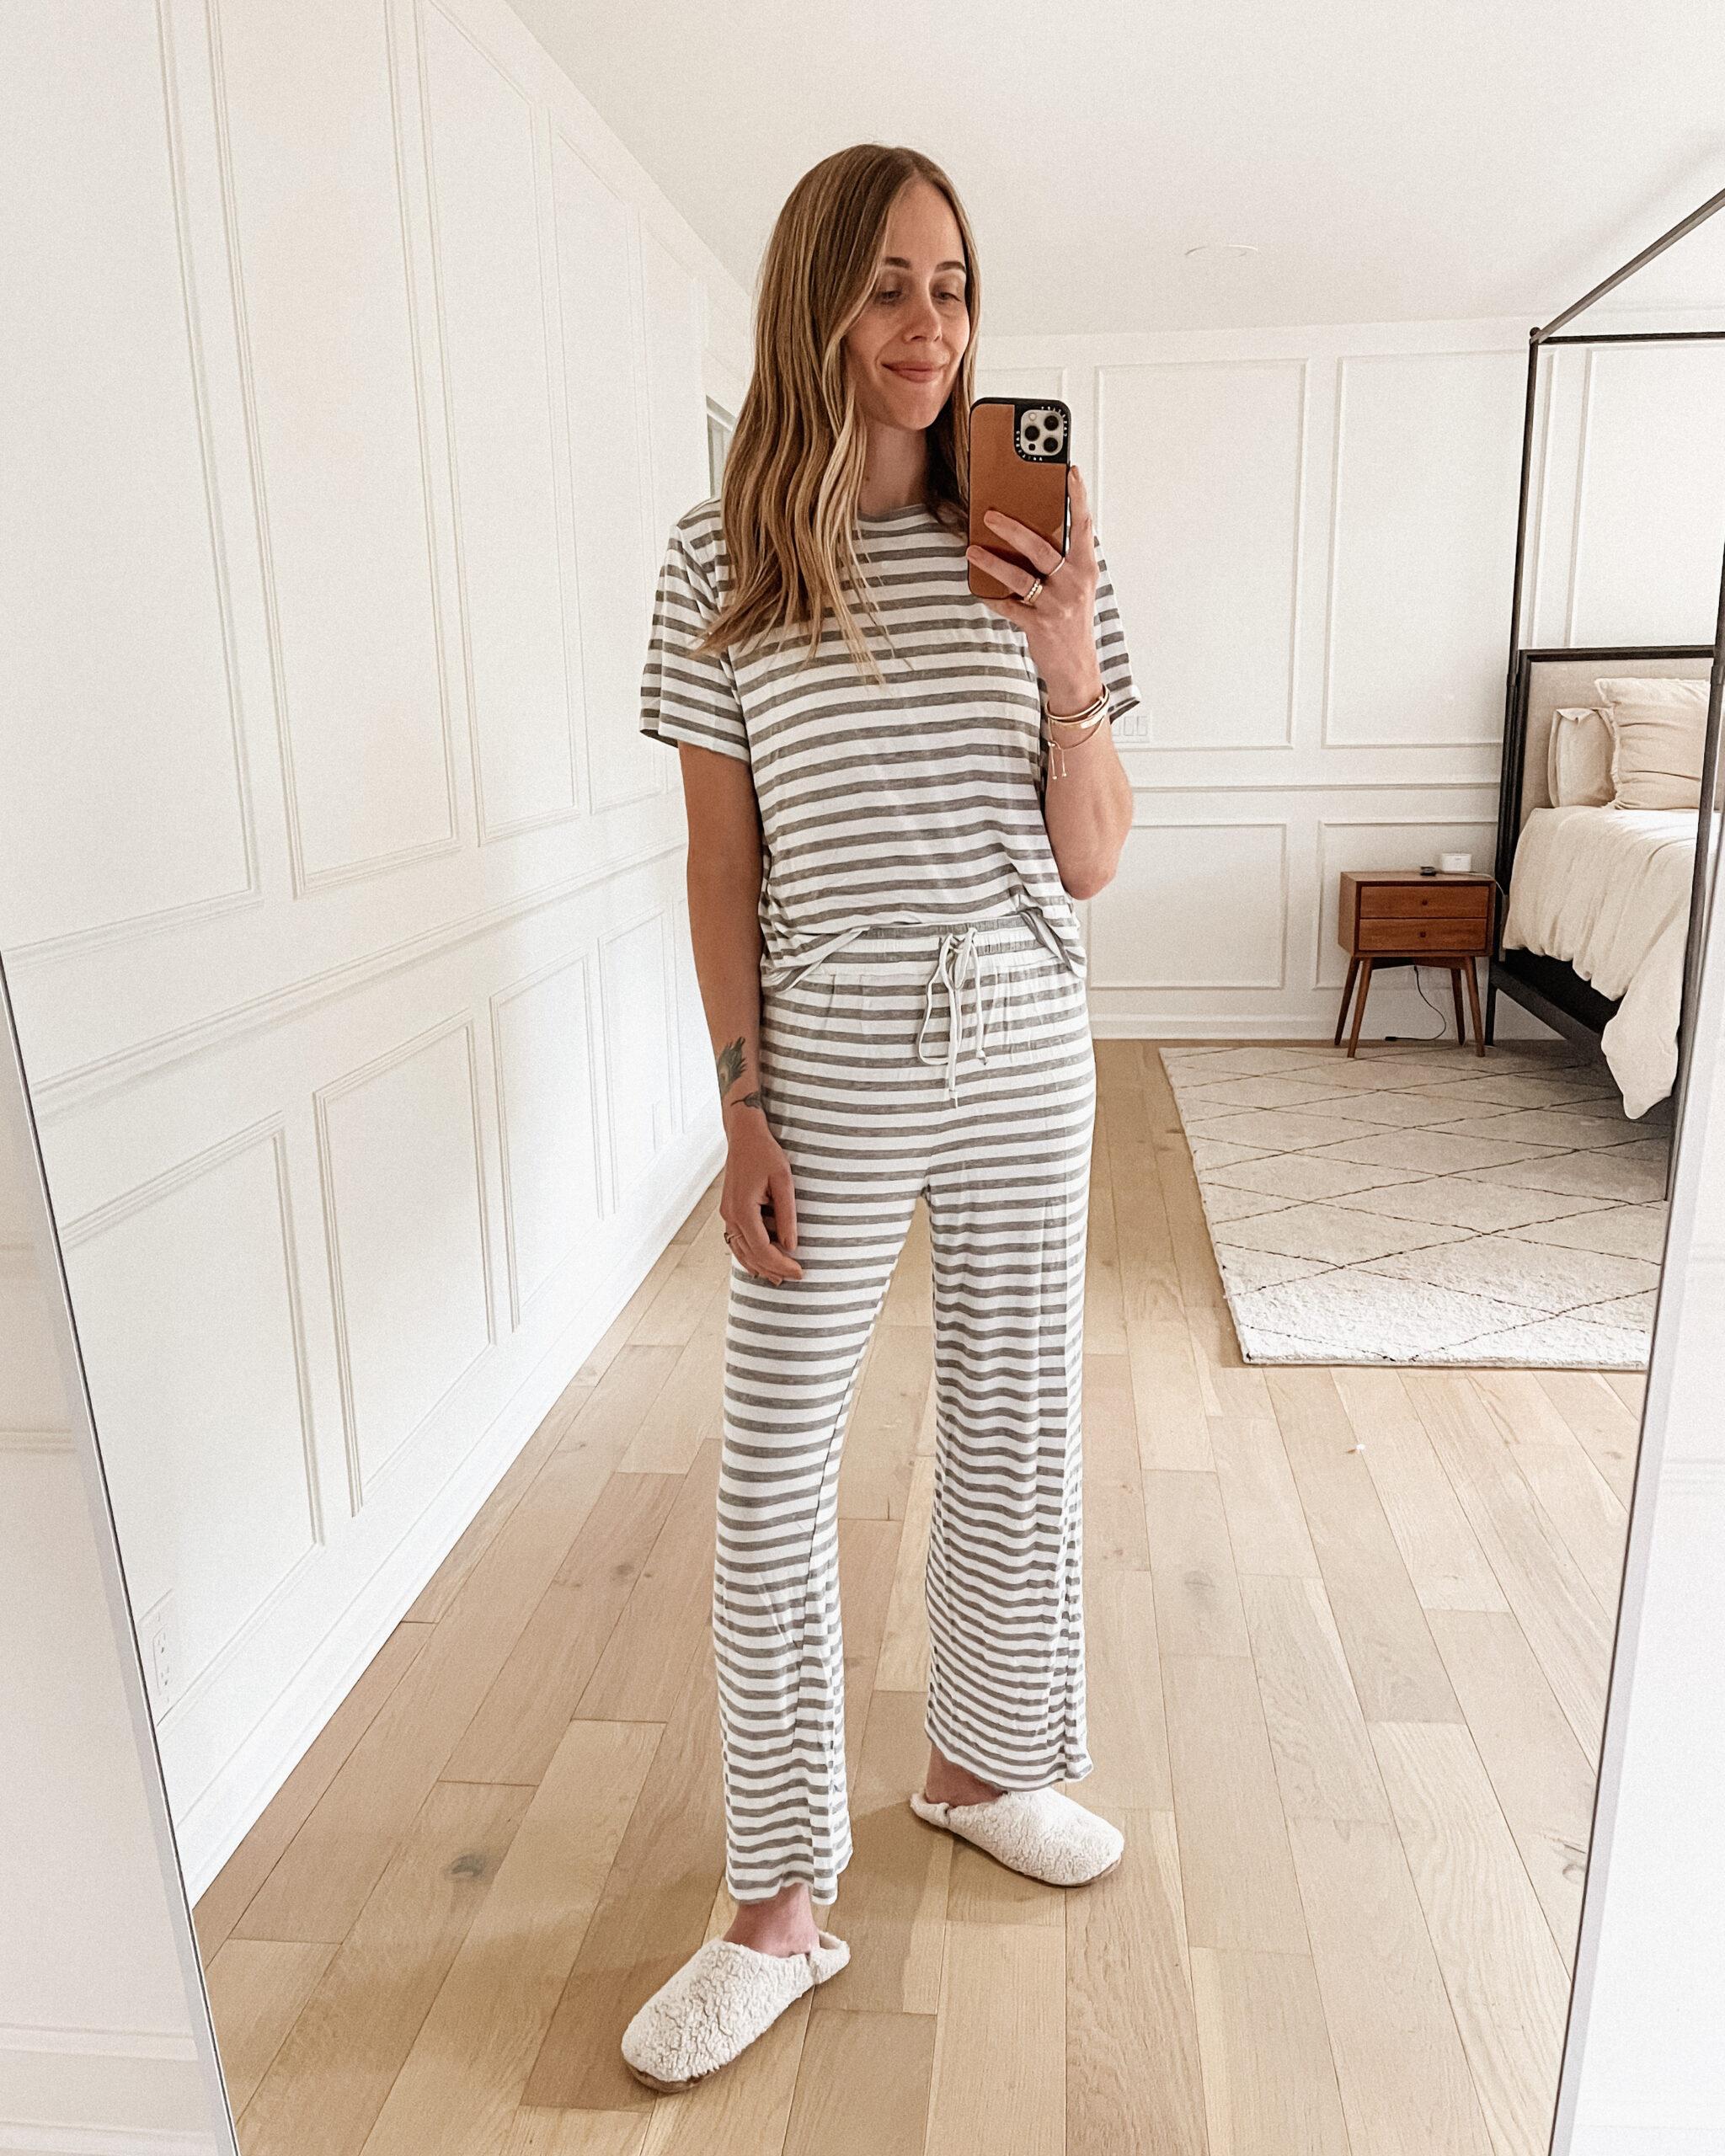 Fashion Jackson Wearing Honeydew Grey White Stripe Pajama Set Jenni Kayne Shearling Slippers